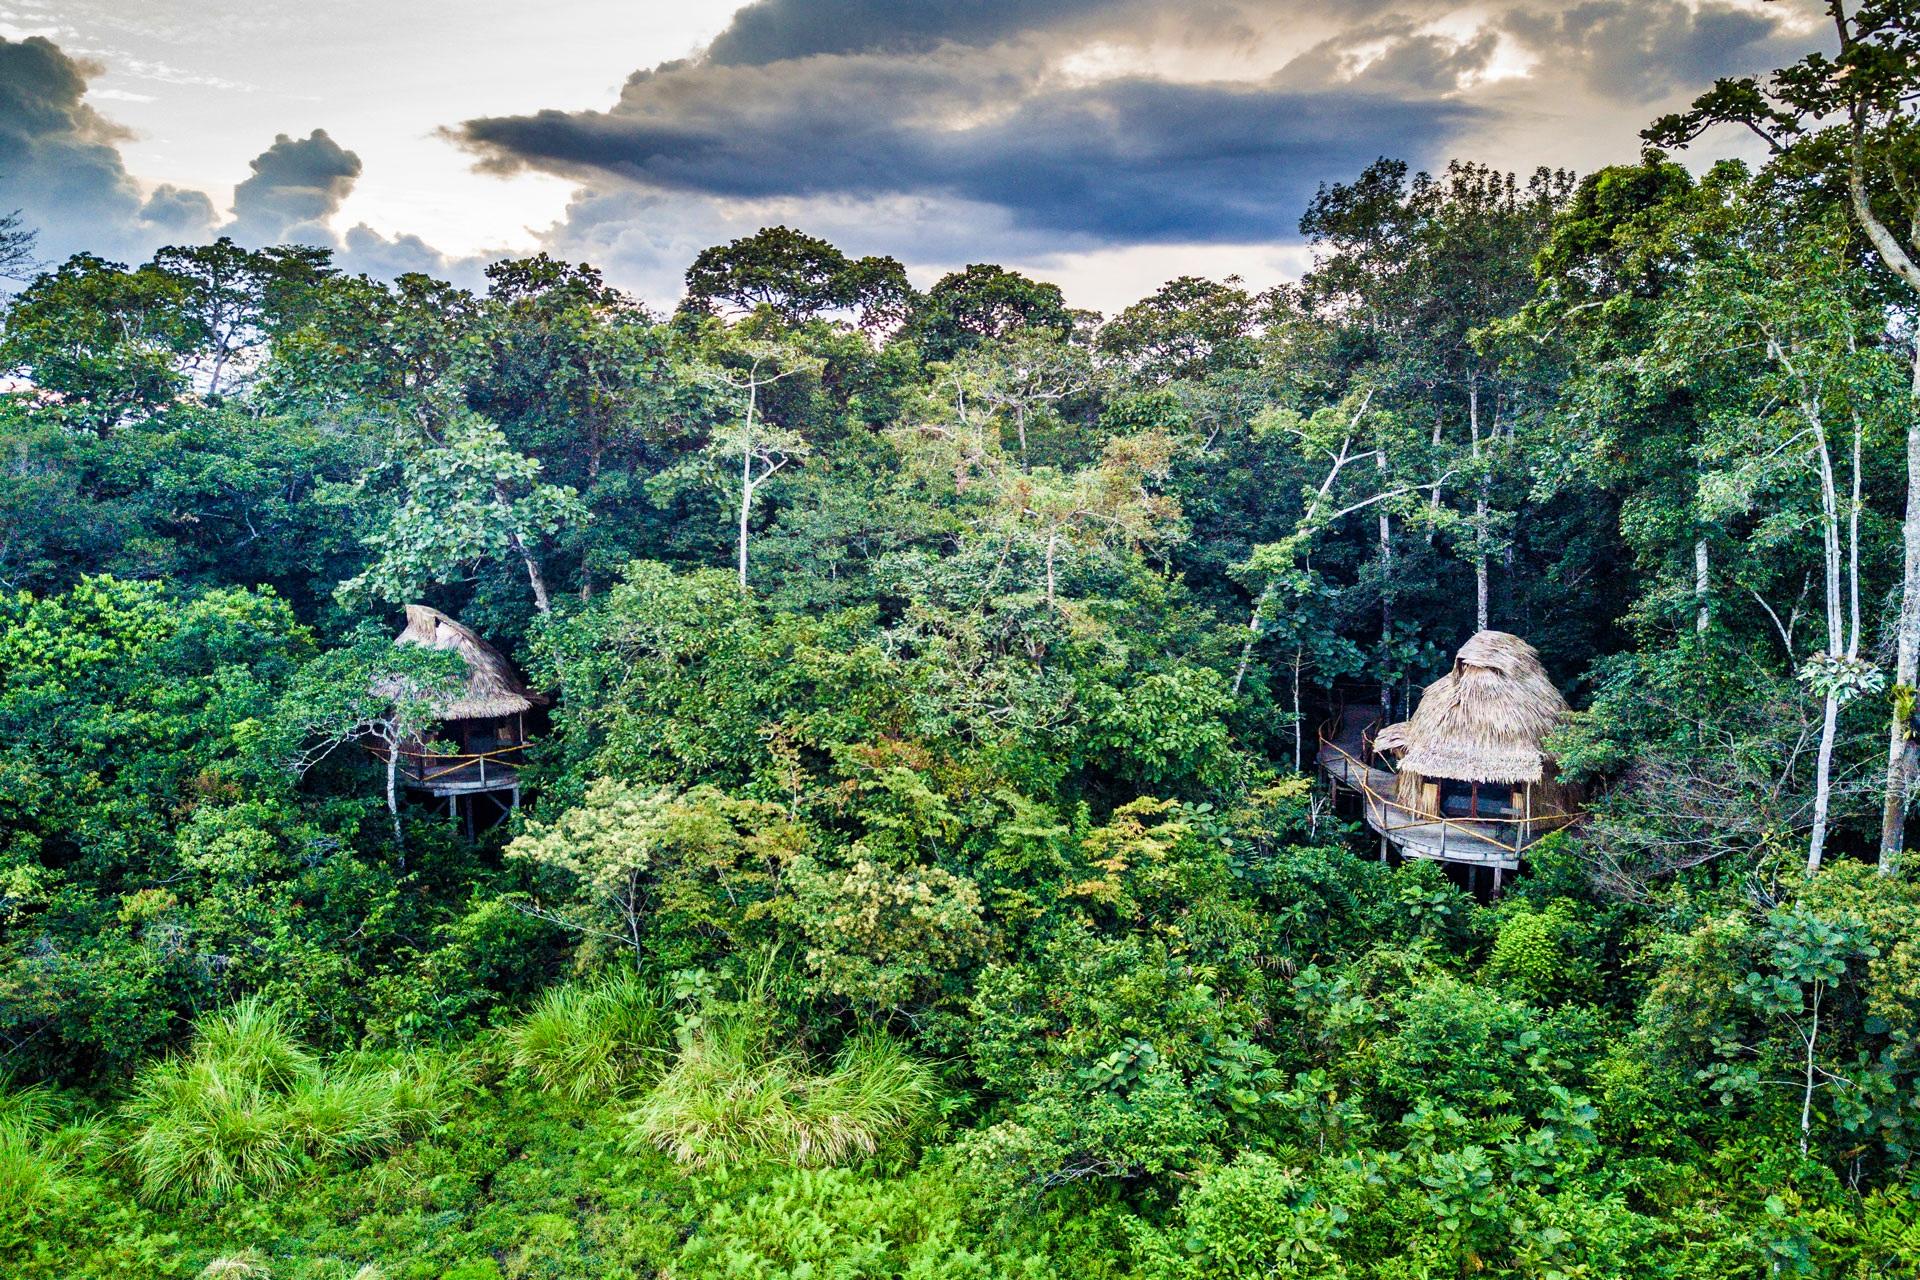 Odzala Discovery Camps Congo Brazzaville